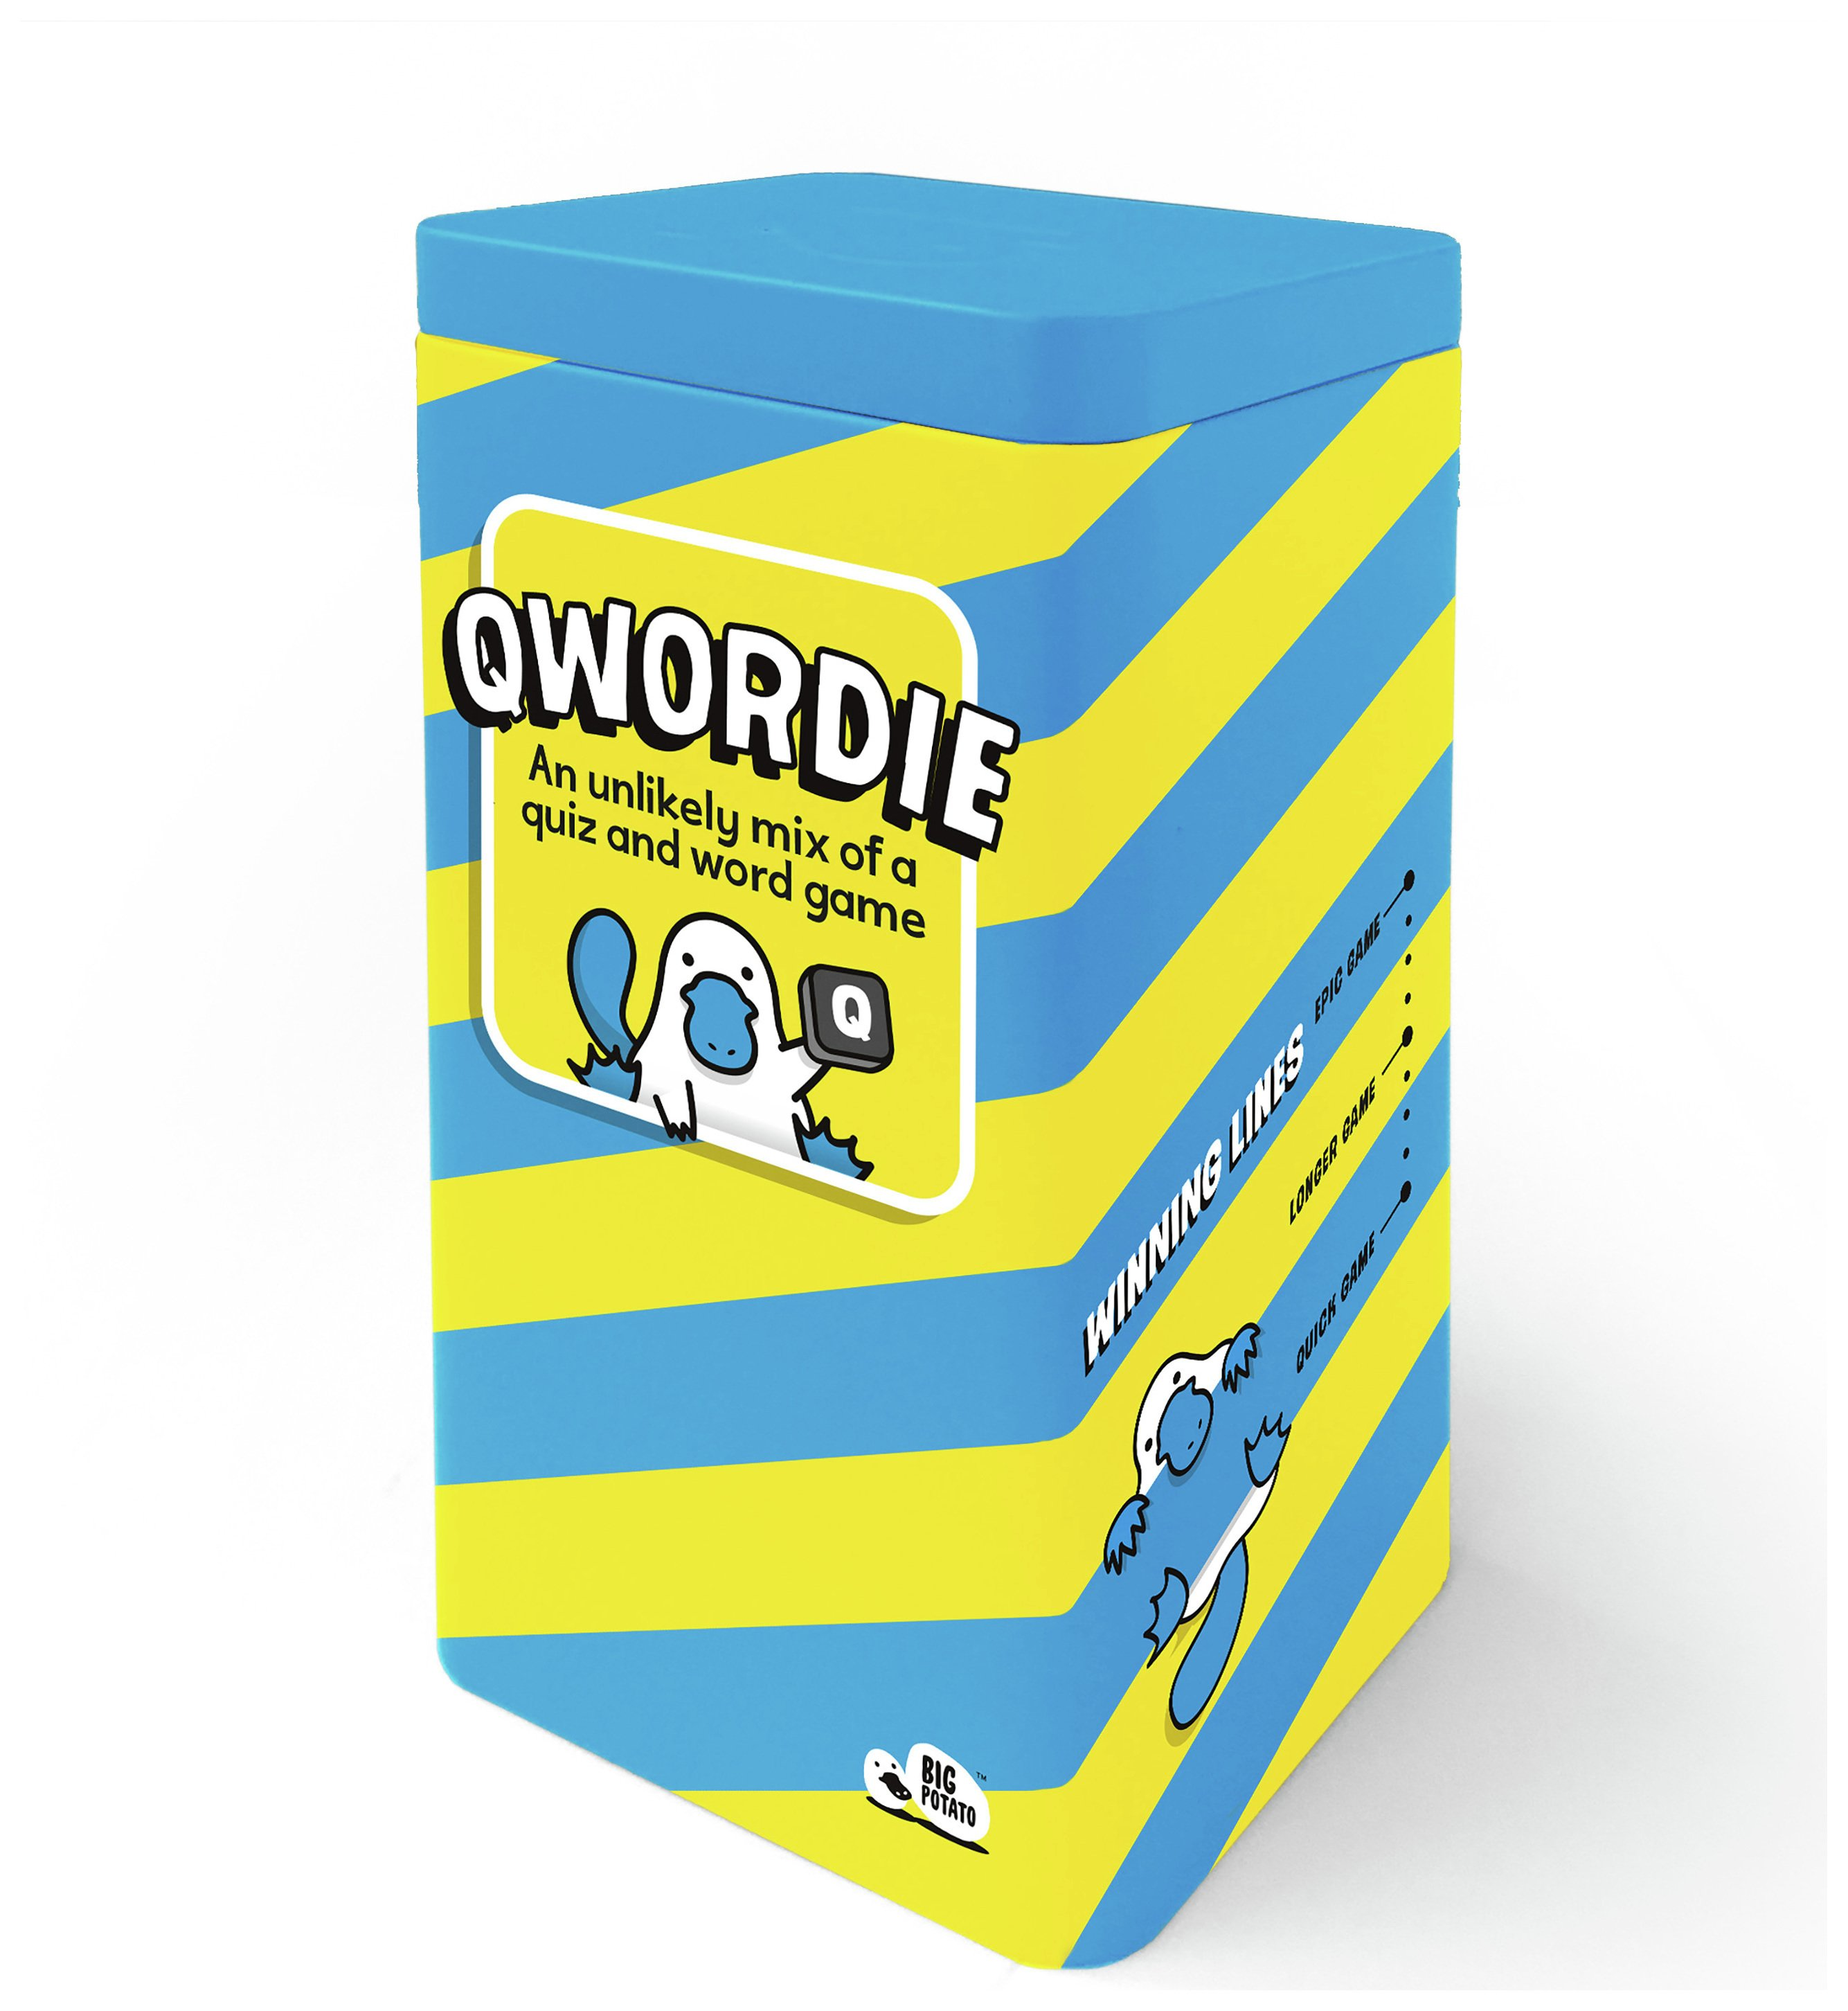 Image of Big Potato - QWordie Game.